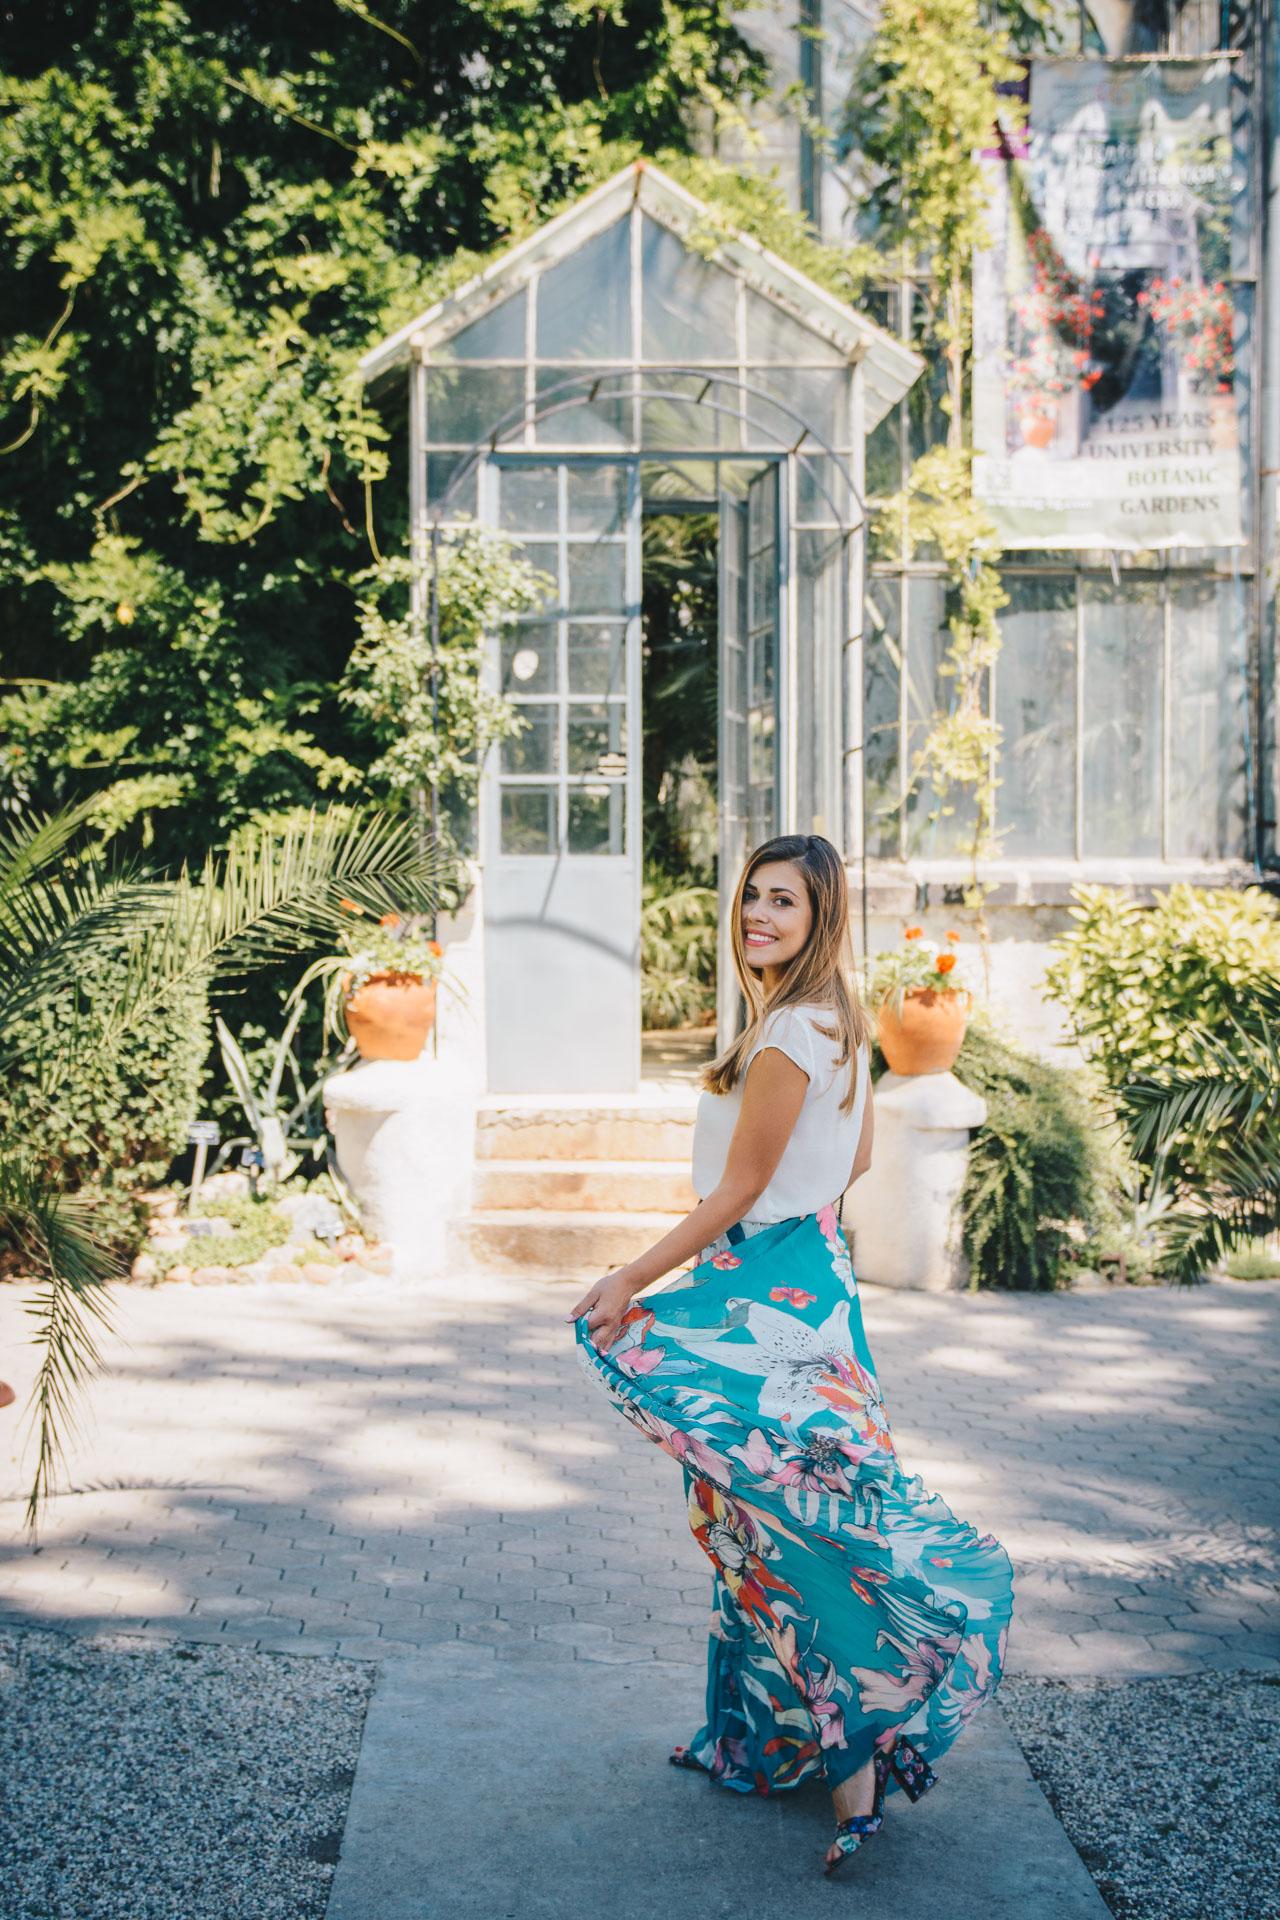 Botanical Garden - Floral skirt botanic garden